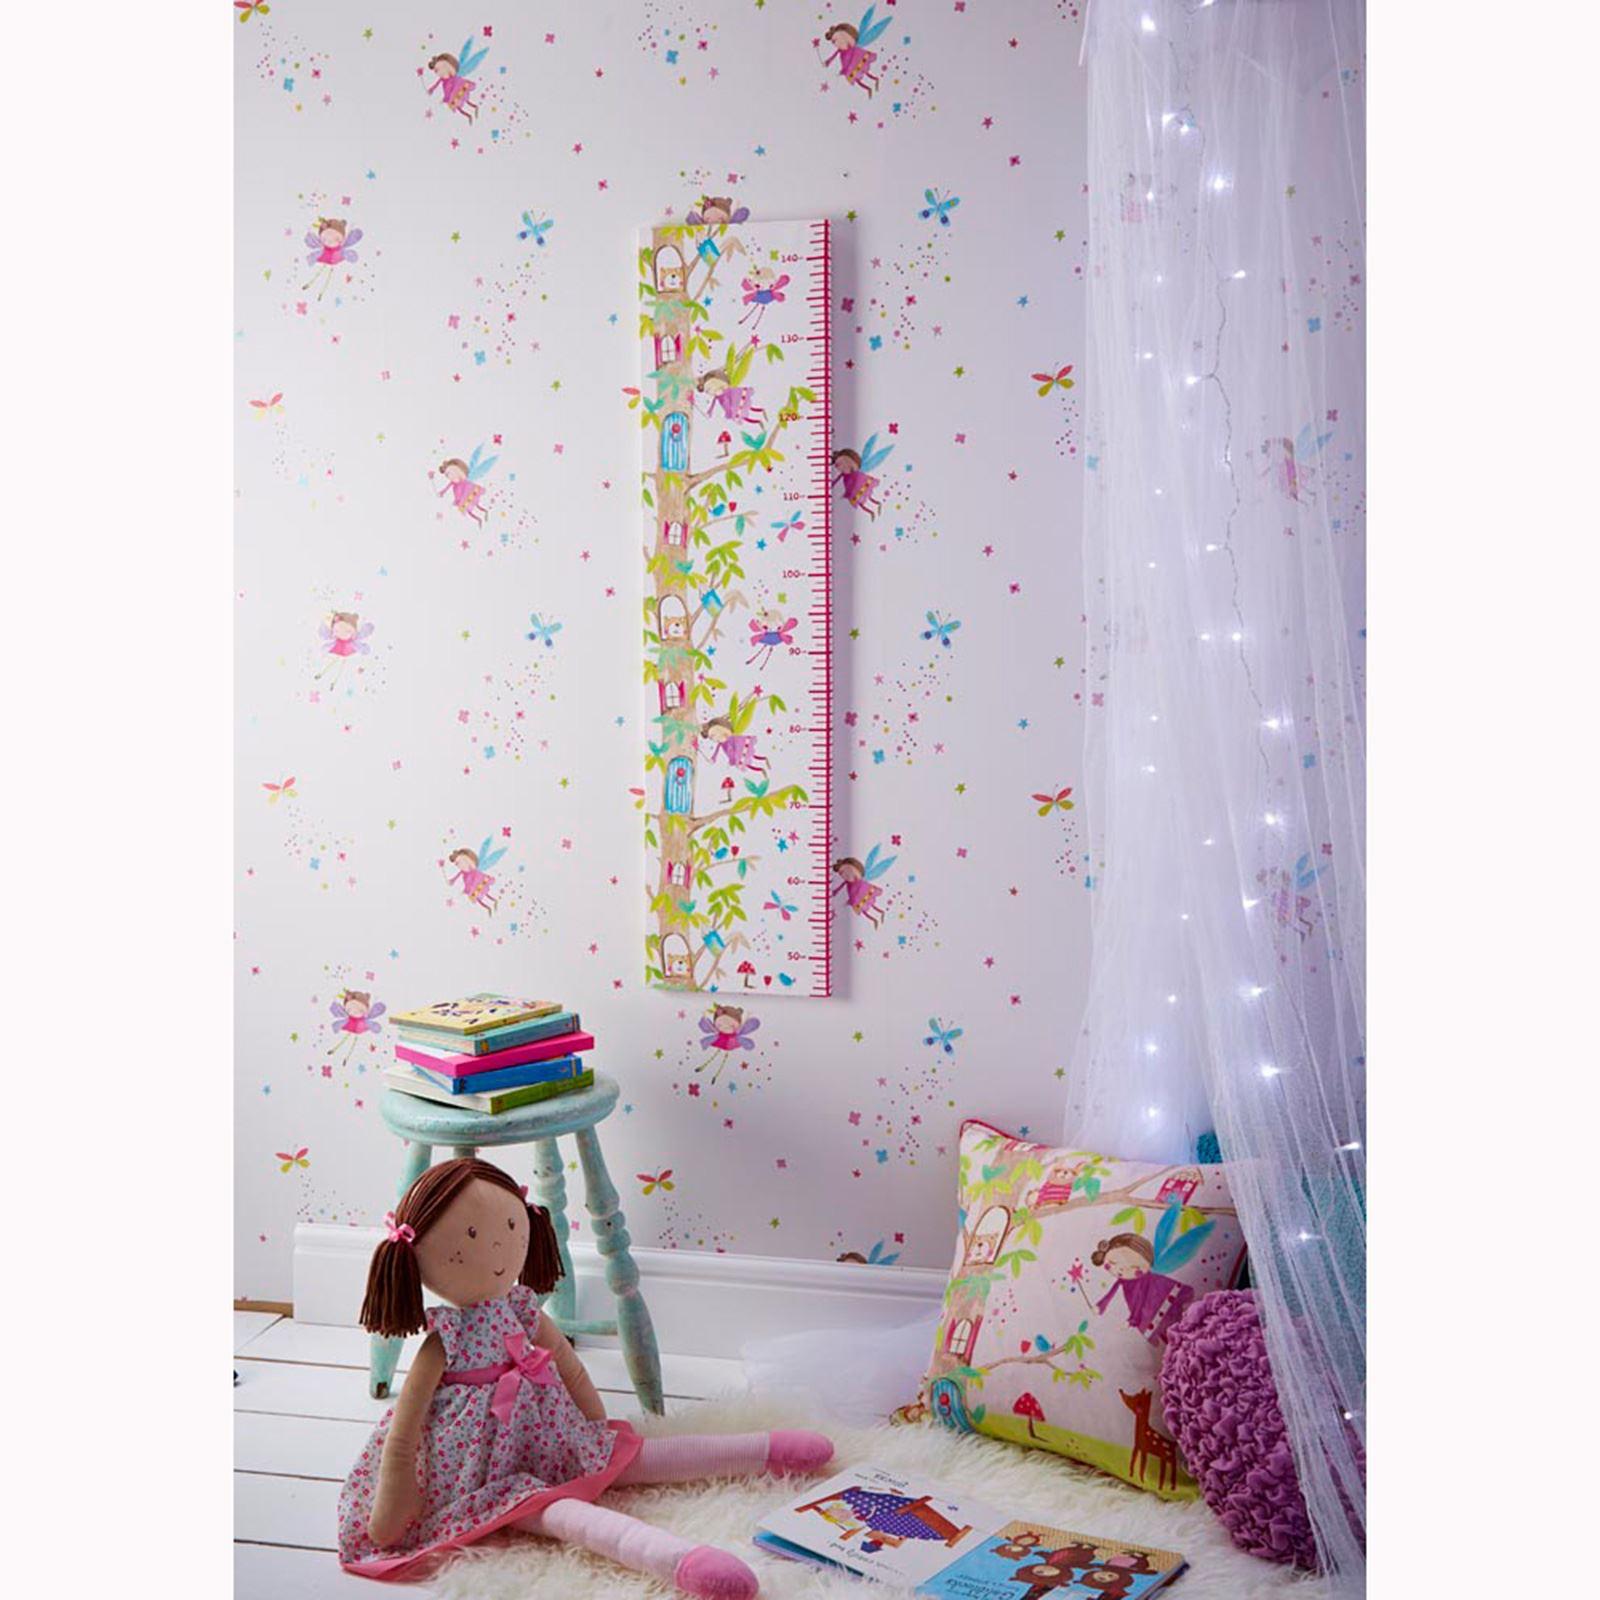 ARTHOUSE-GLITTER-DETAIL-KIDS-WALLPAPER-BEDROOM-UNICORN-MERMAID-SPACE thumbnail 35